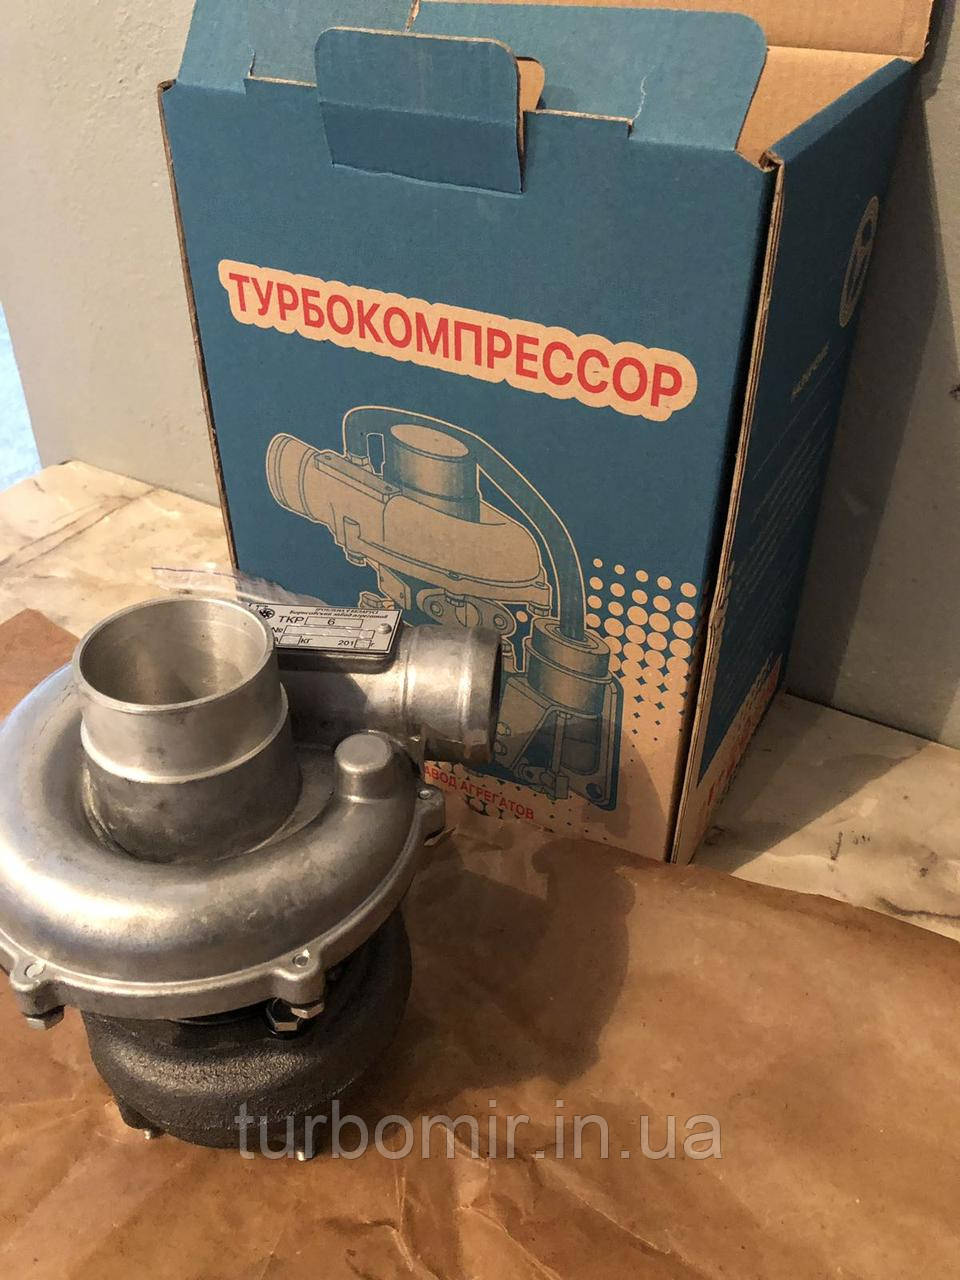 Турбокомпрессор Турбина ТКР 6 (МТЗ, ЮМЗ, Зил Бычок, Д-240,245 ТРК)